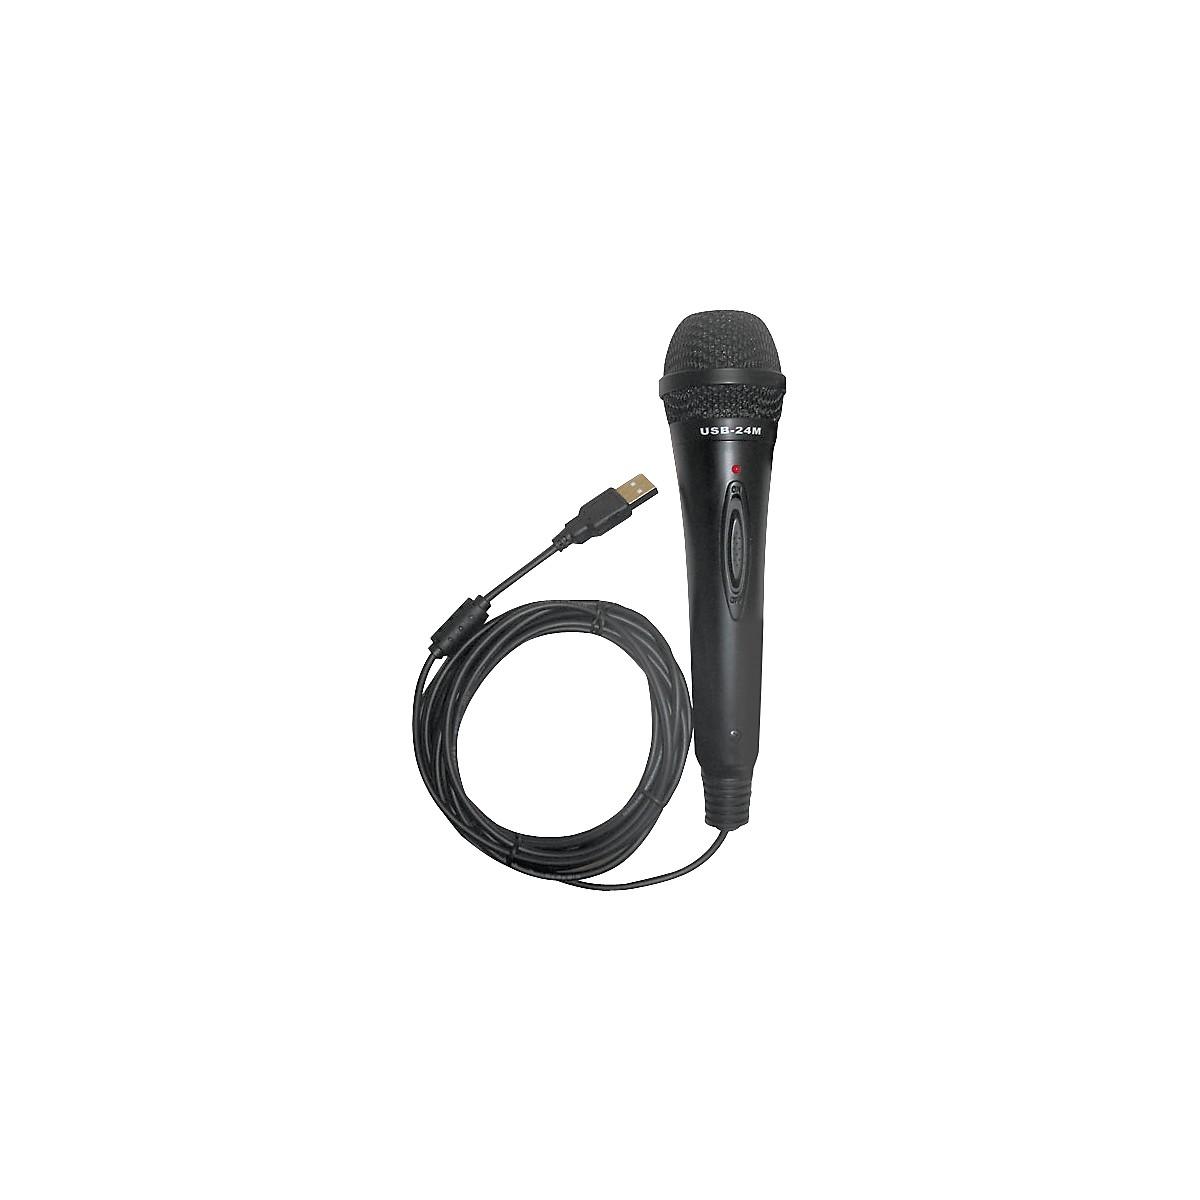 Nady USB-24M USB microphone